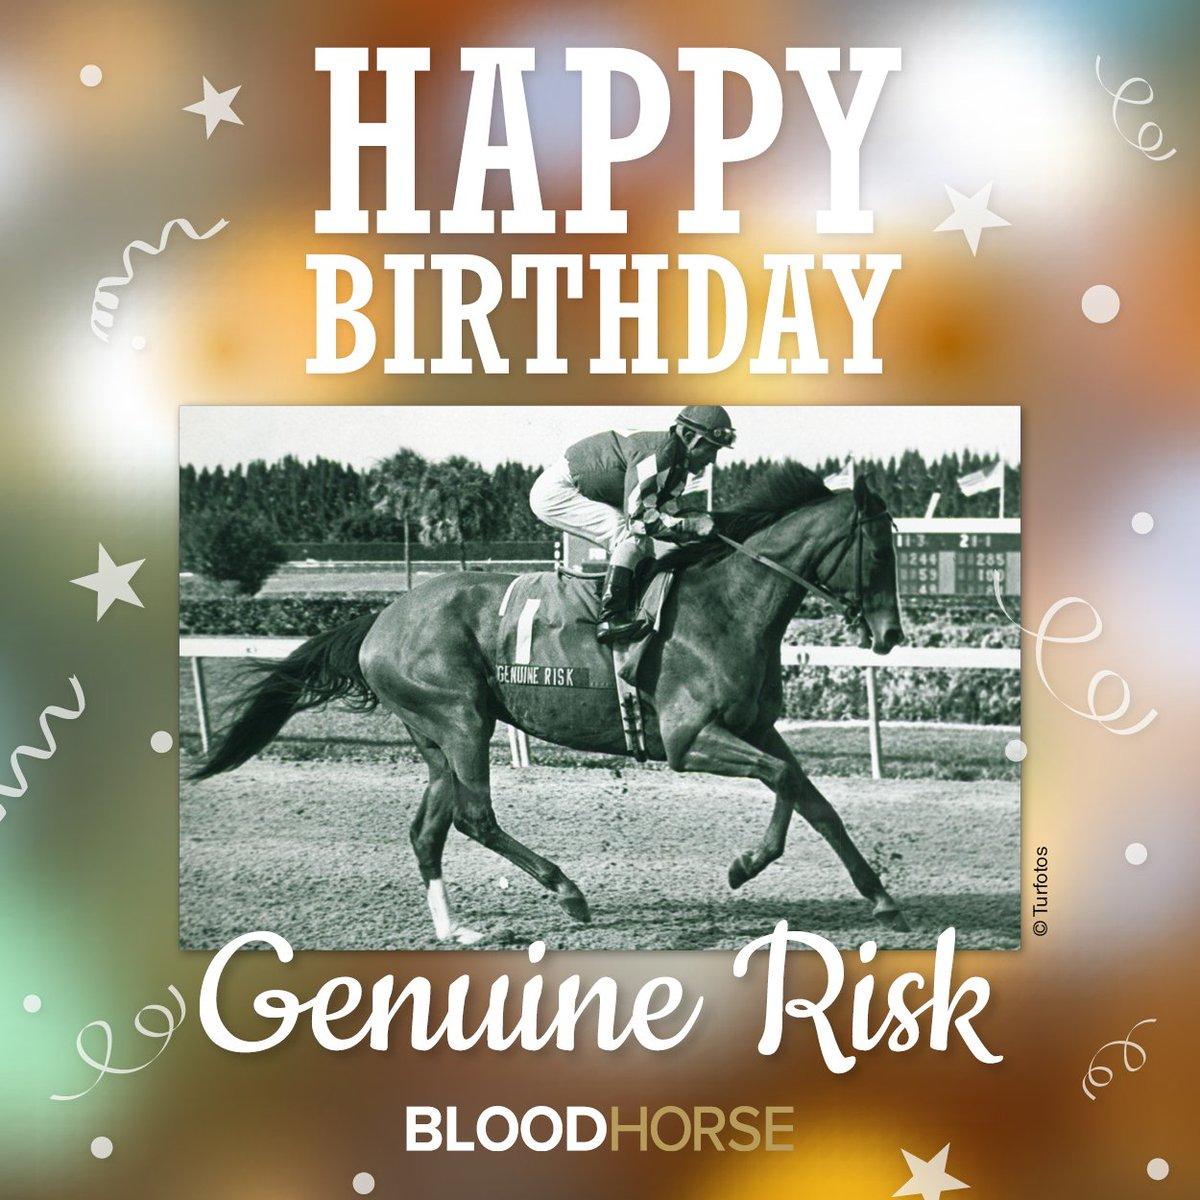 BloodHorse On Twitter Celebrating The Birthday Of 1980 Kentucky Derby Winner Genuine Risk Born February 15 1977